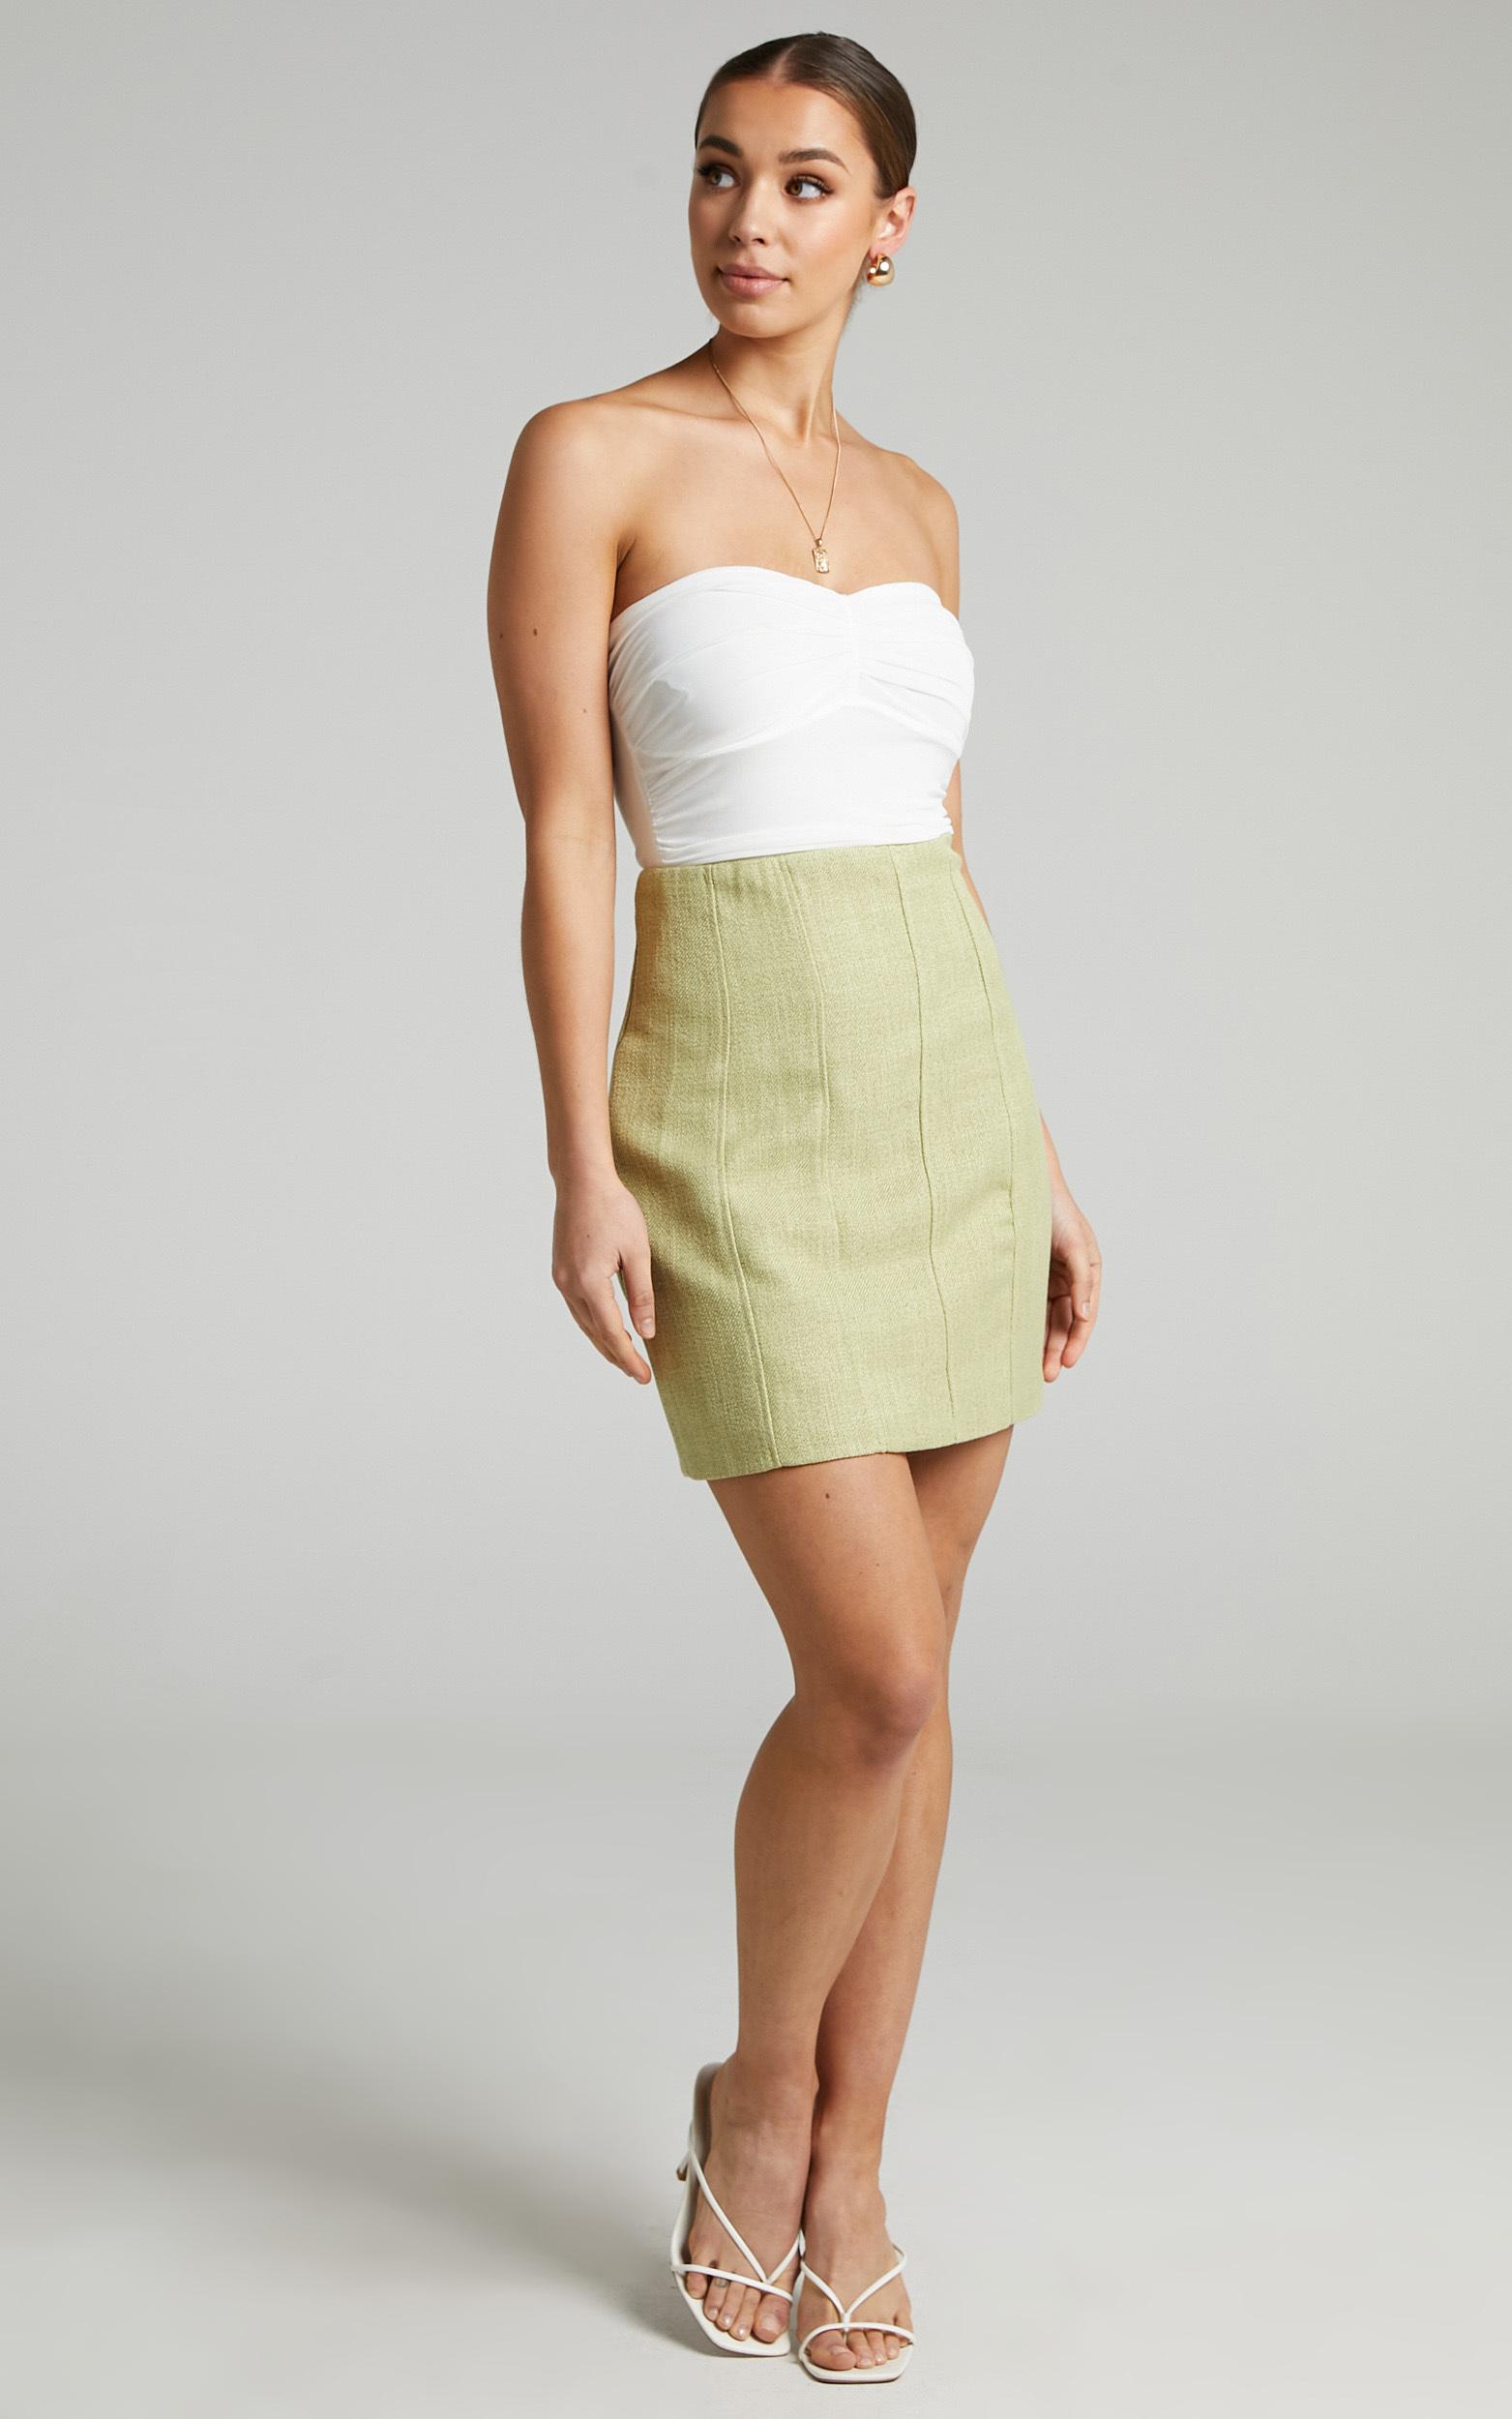 Miree Mini Panelled Tweed Skirt in Green - 04, GRN2, hi-res image number null